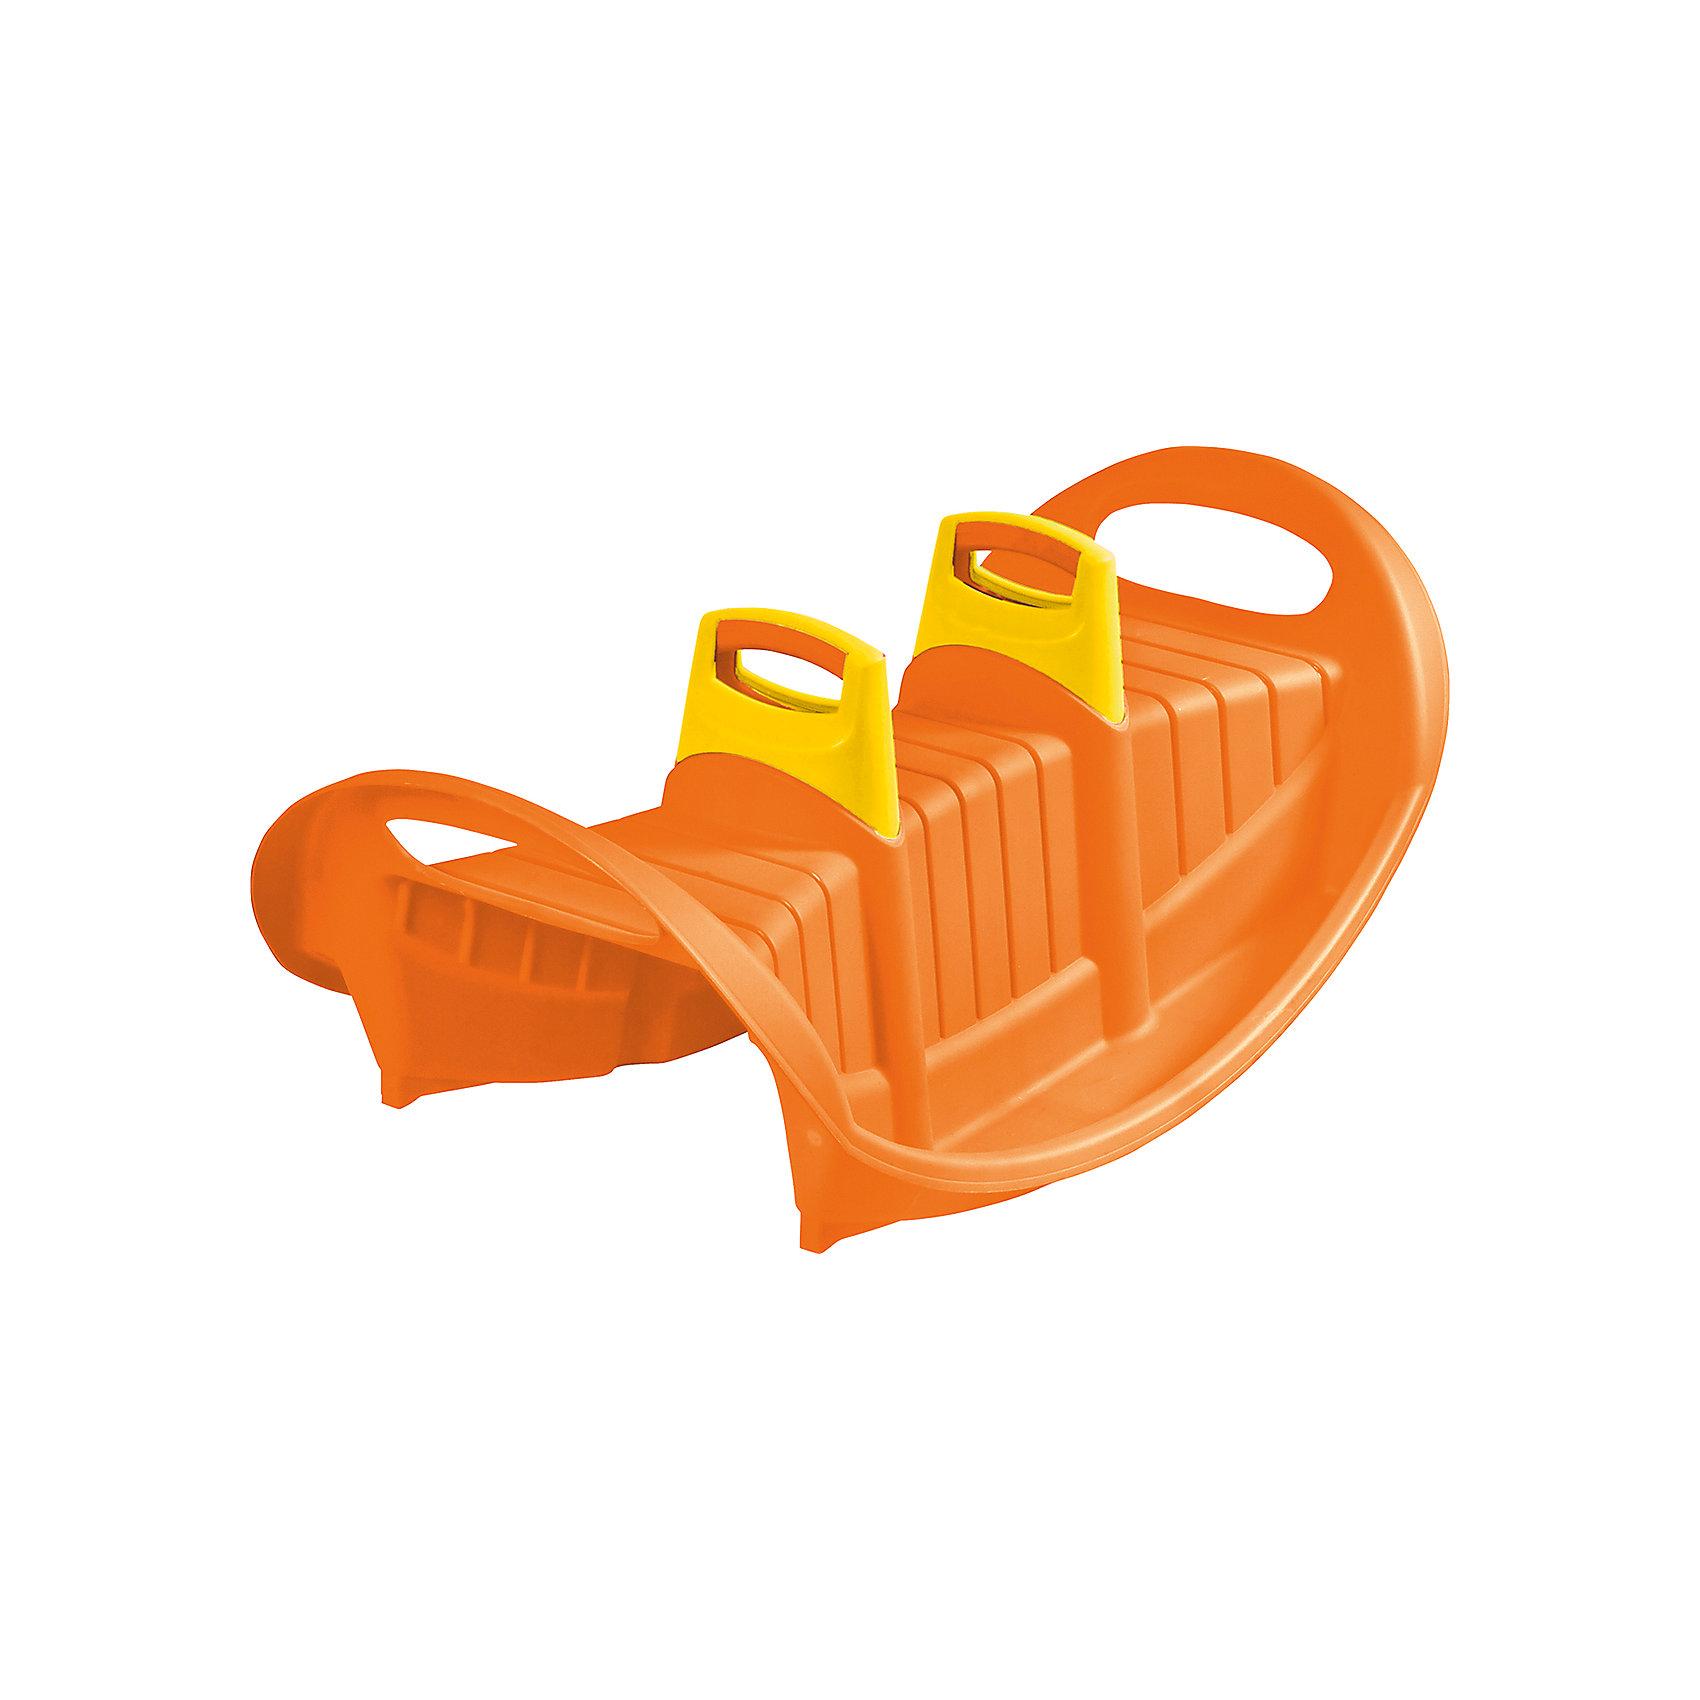 Качели Трио, оранжевые, Marianplast